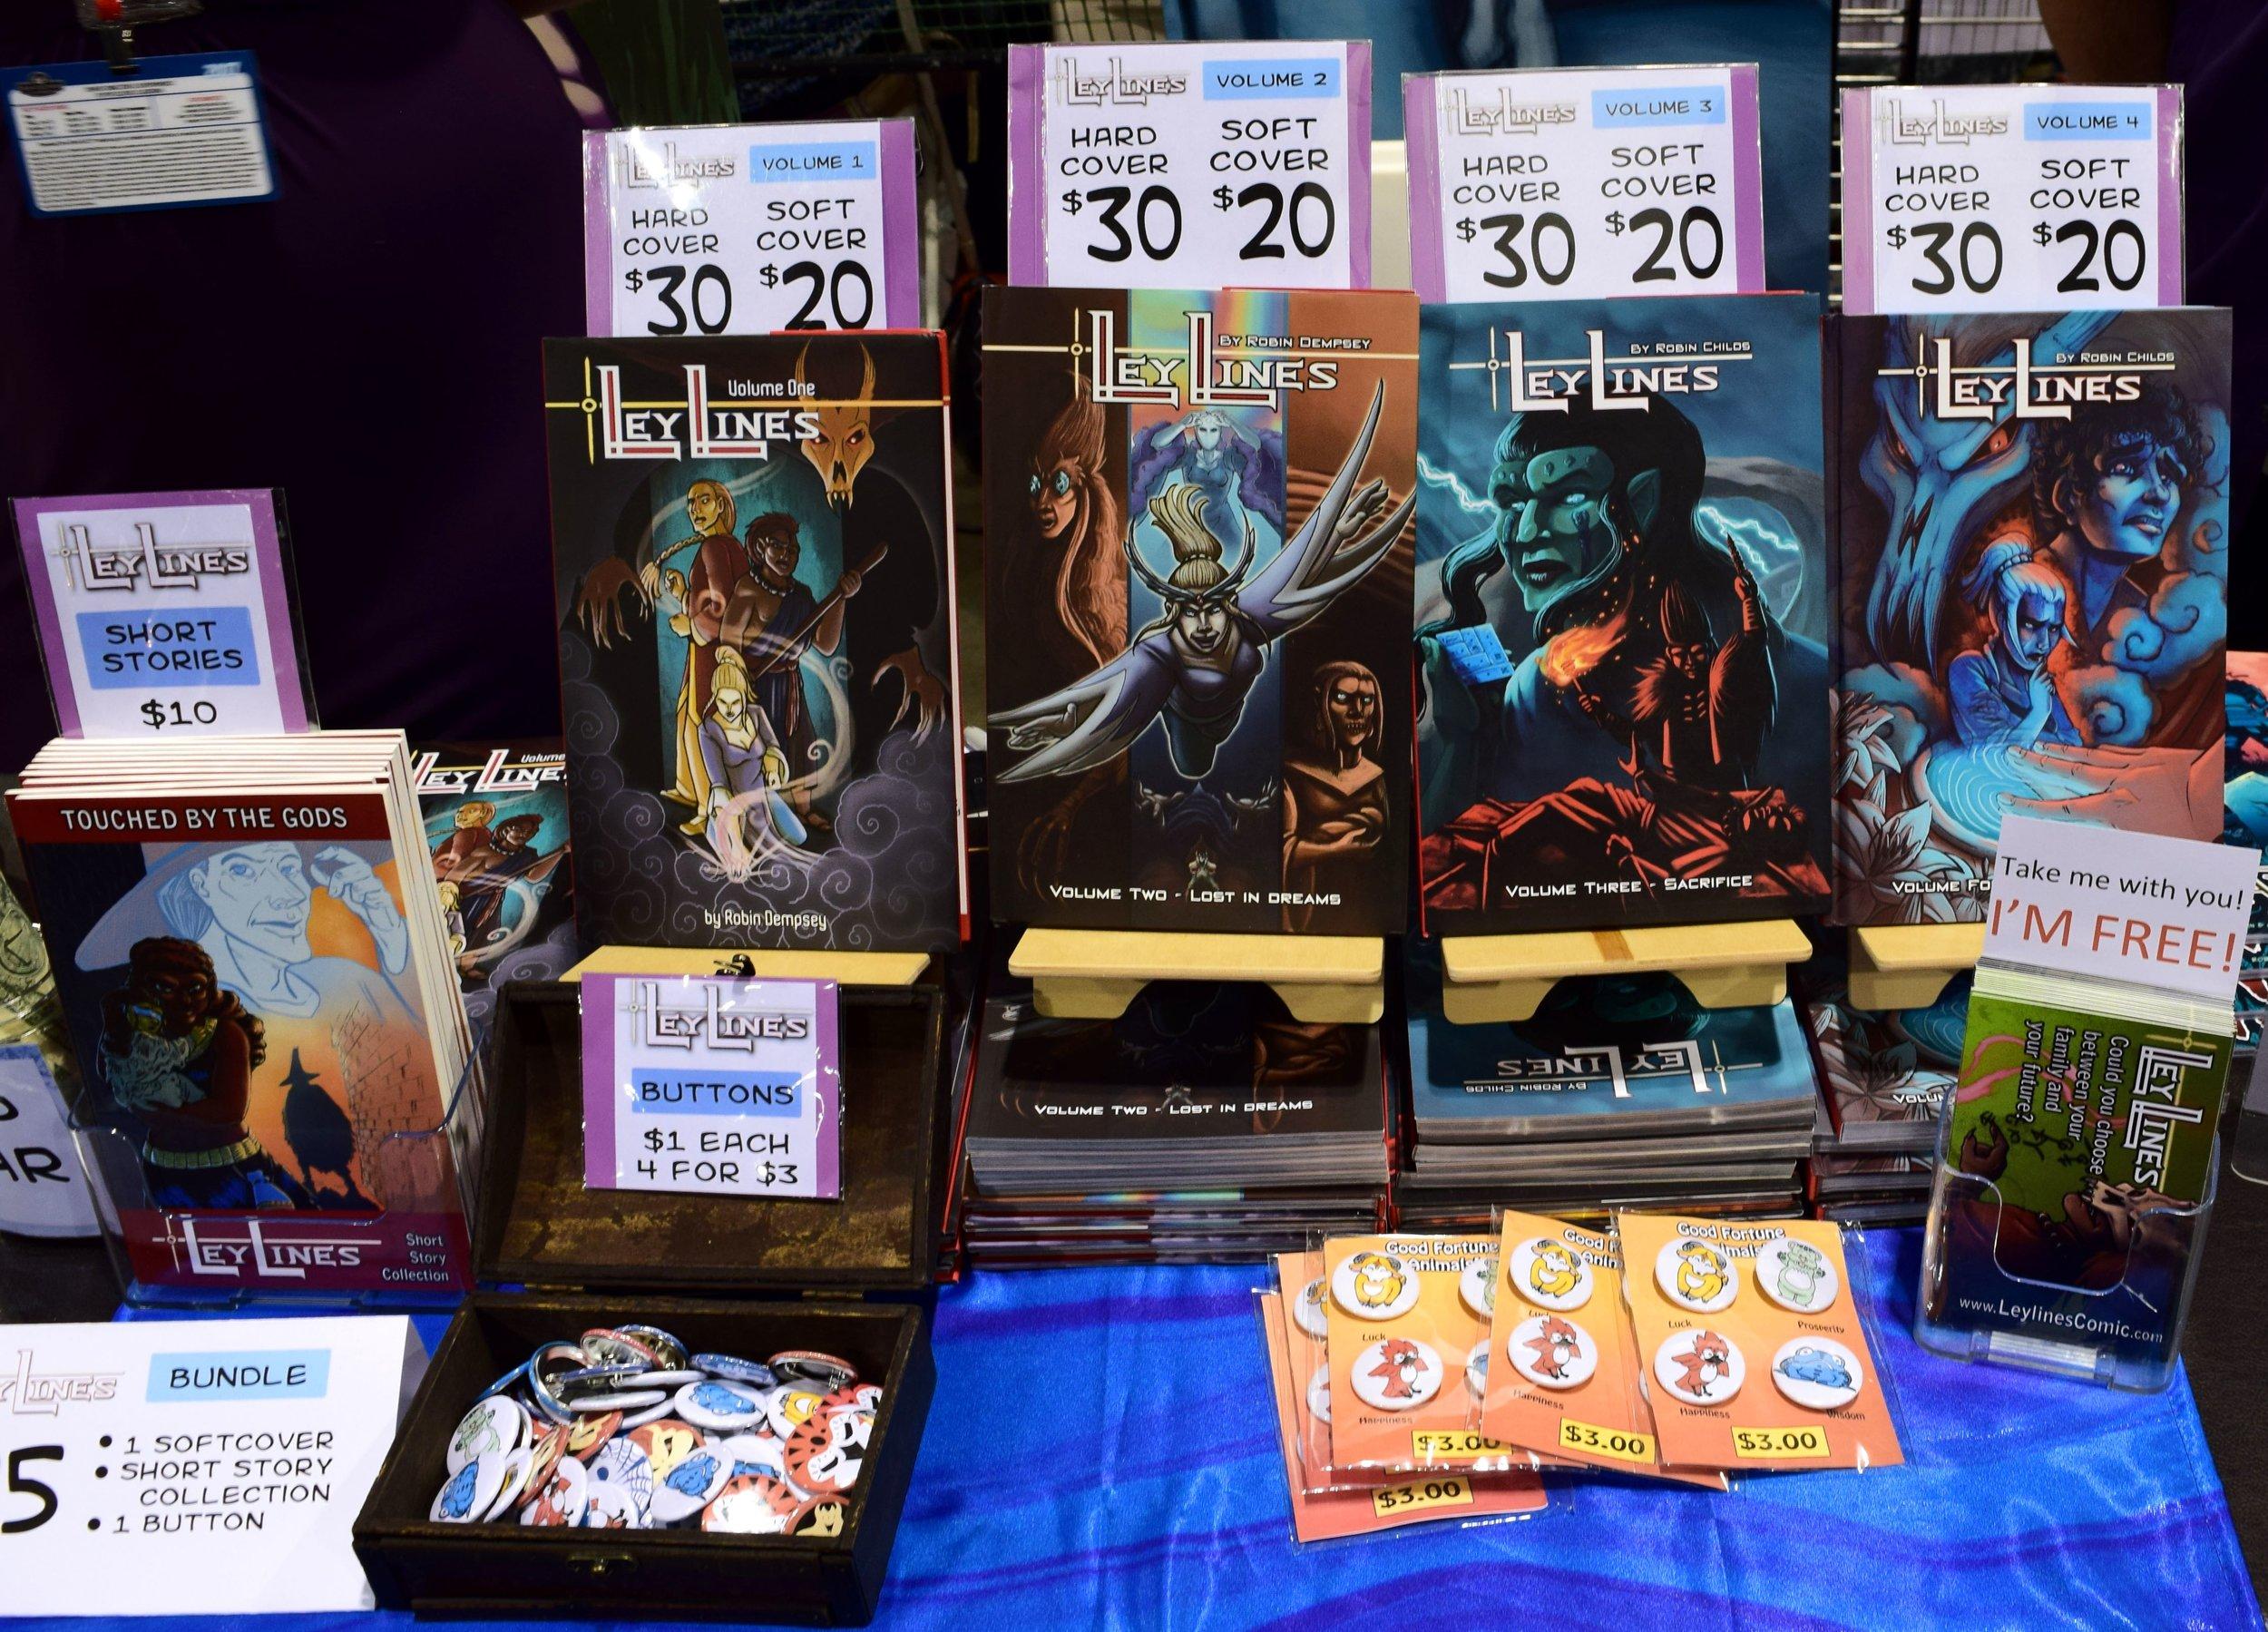 LeyLines books at Denver Comic COn 2017.